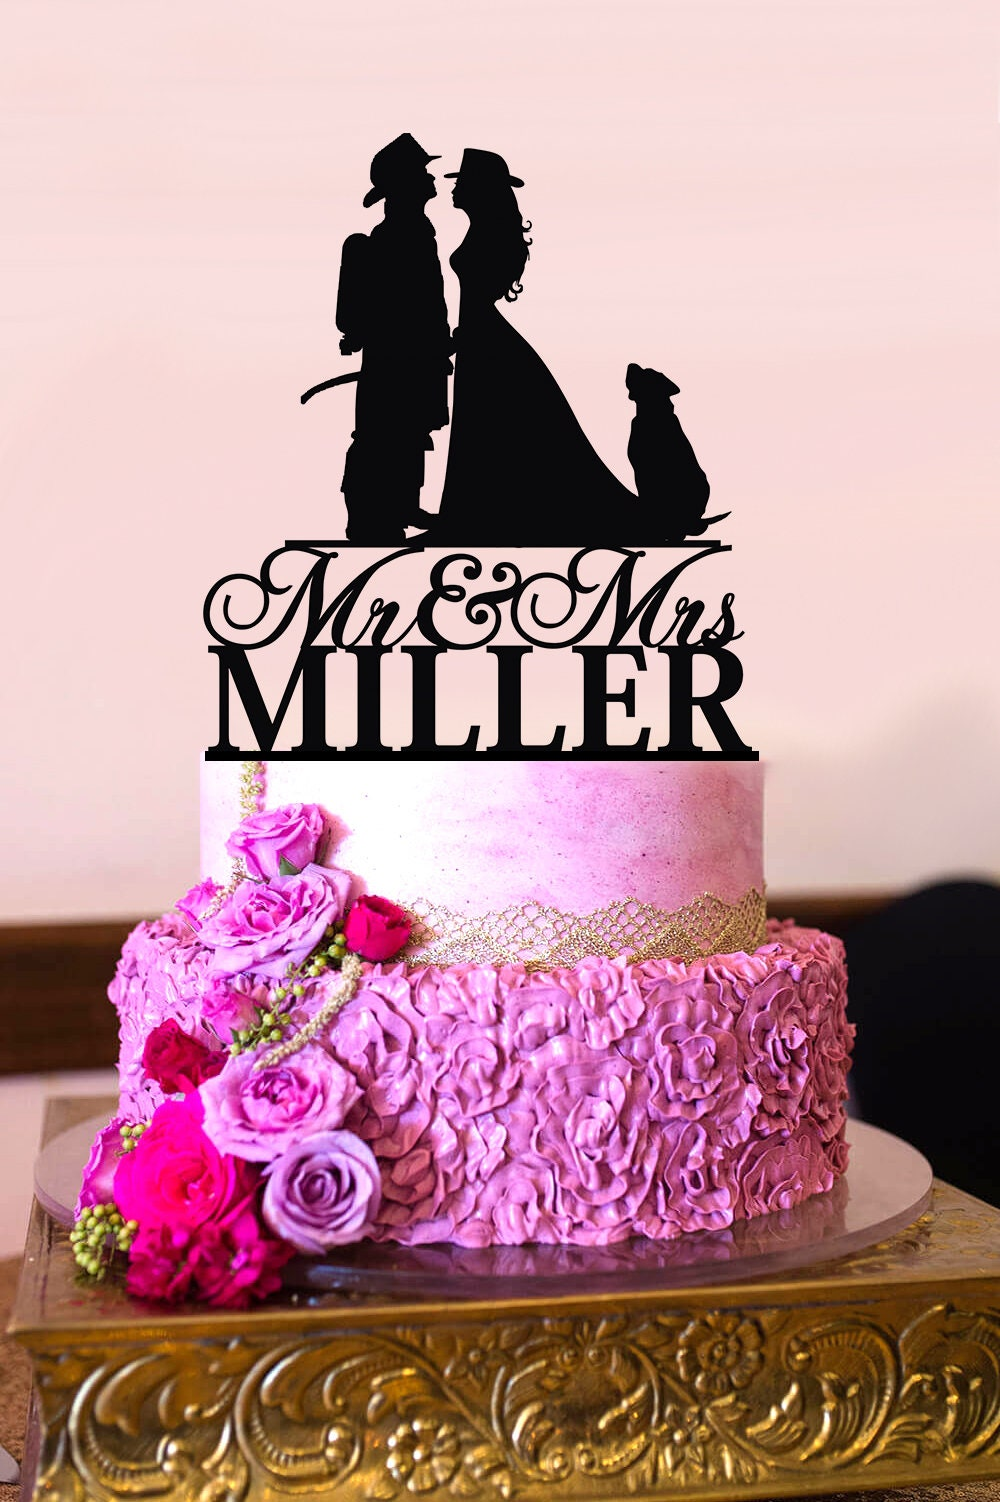 Firefighter Cake Topper Custom Personalized Wedding Cake